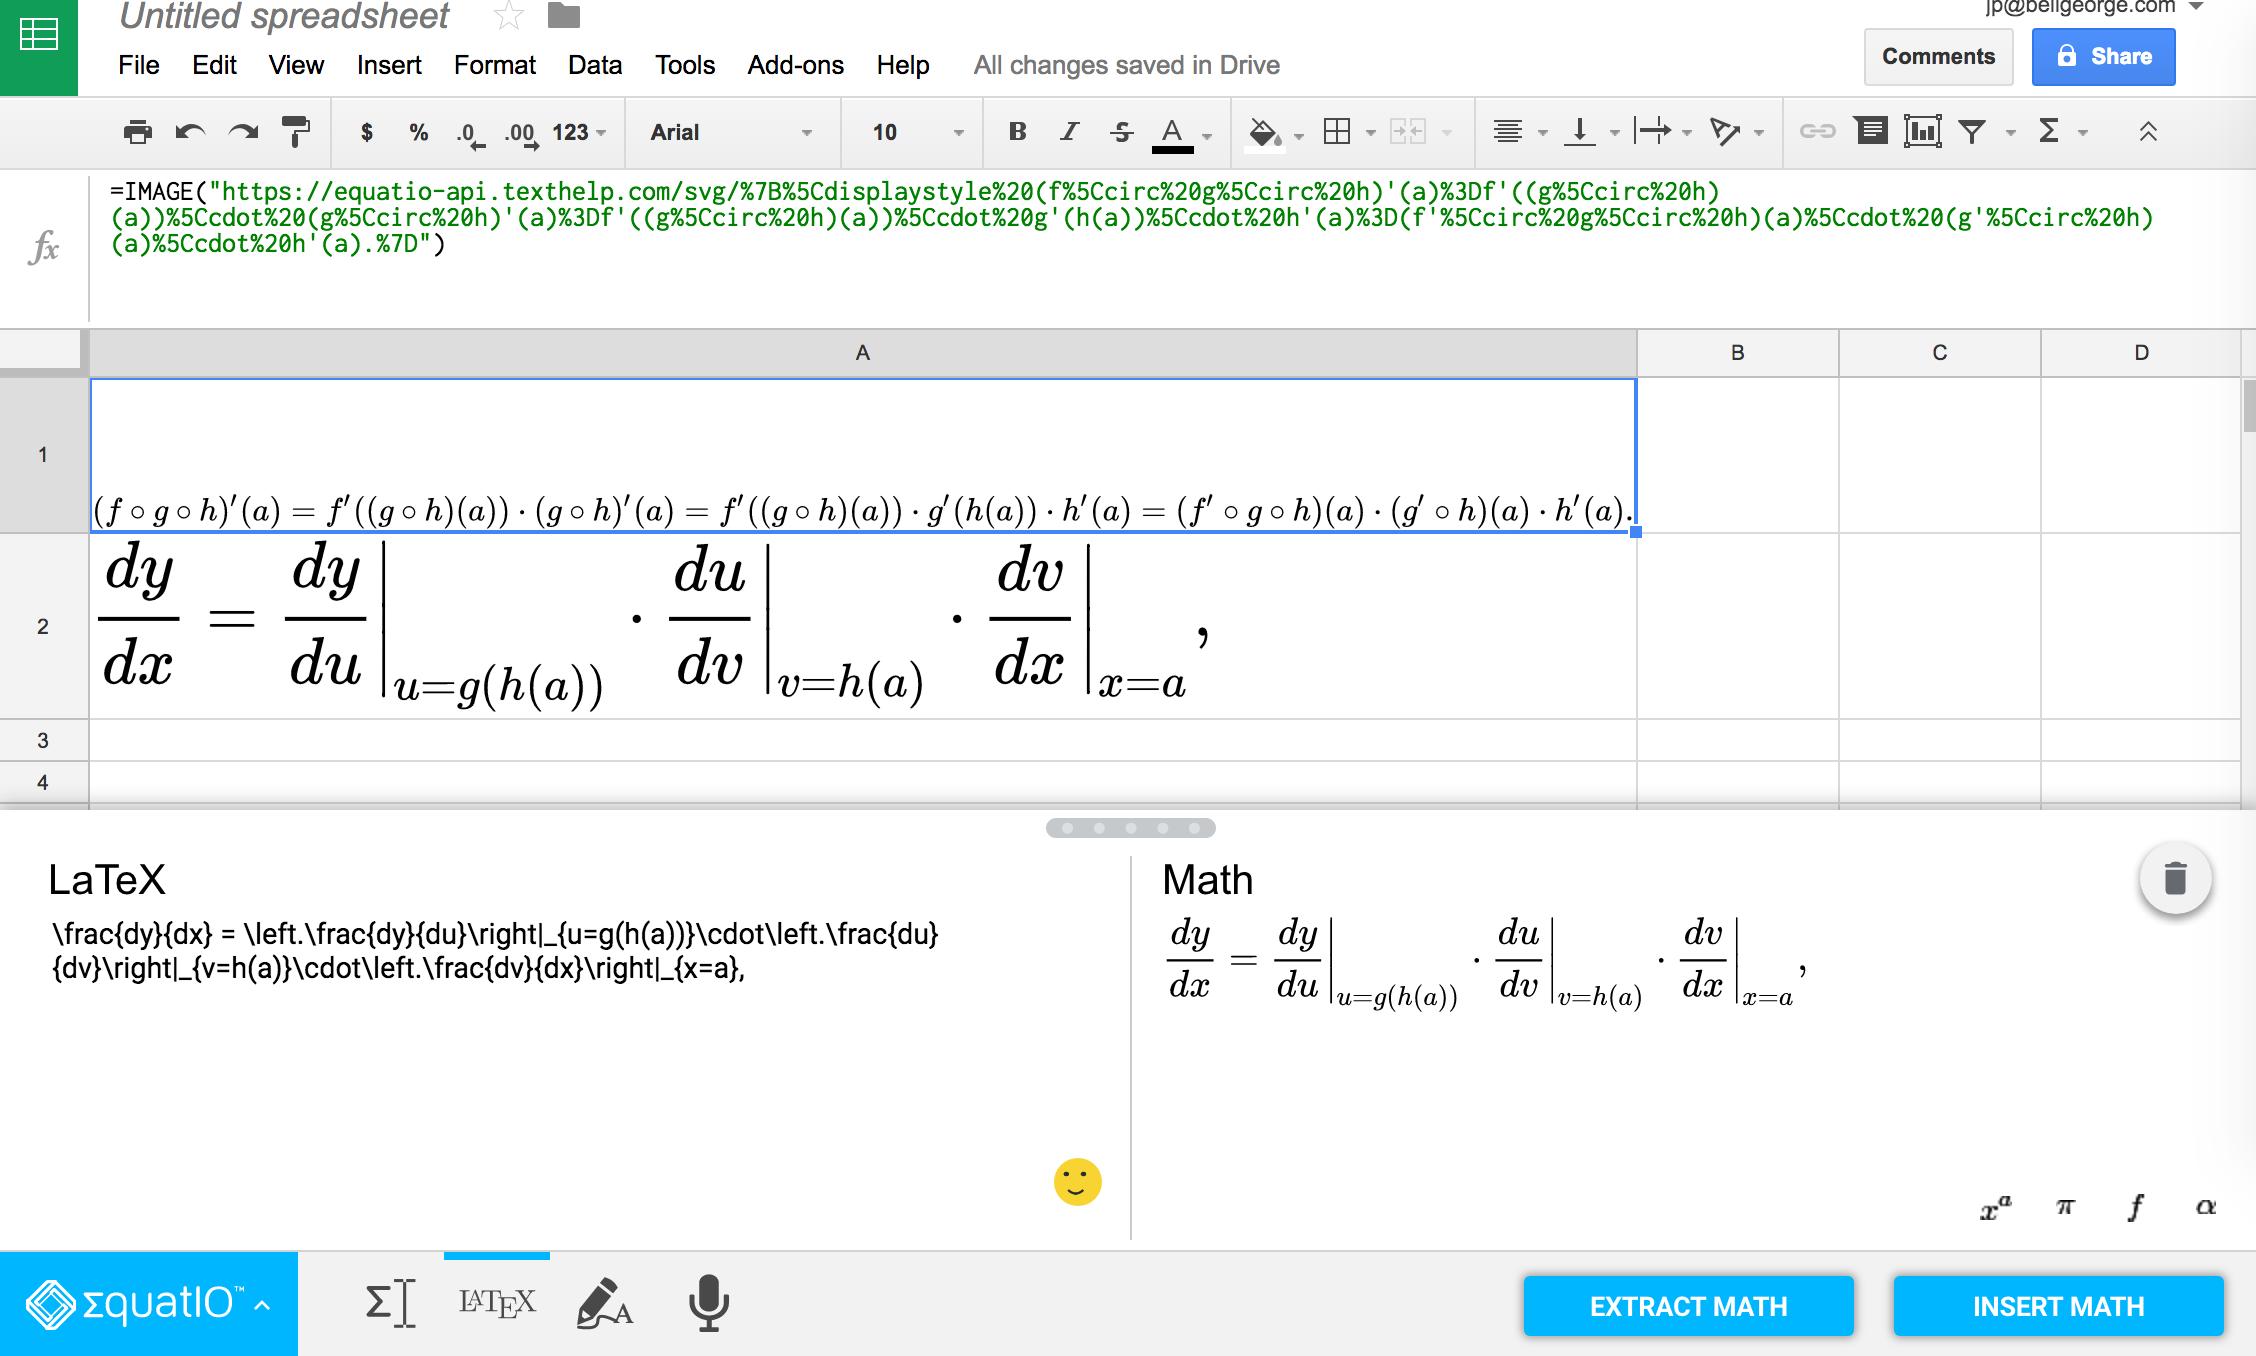 Rendering math equations? · Issue #897 · github/markup · GitHub